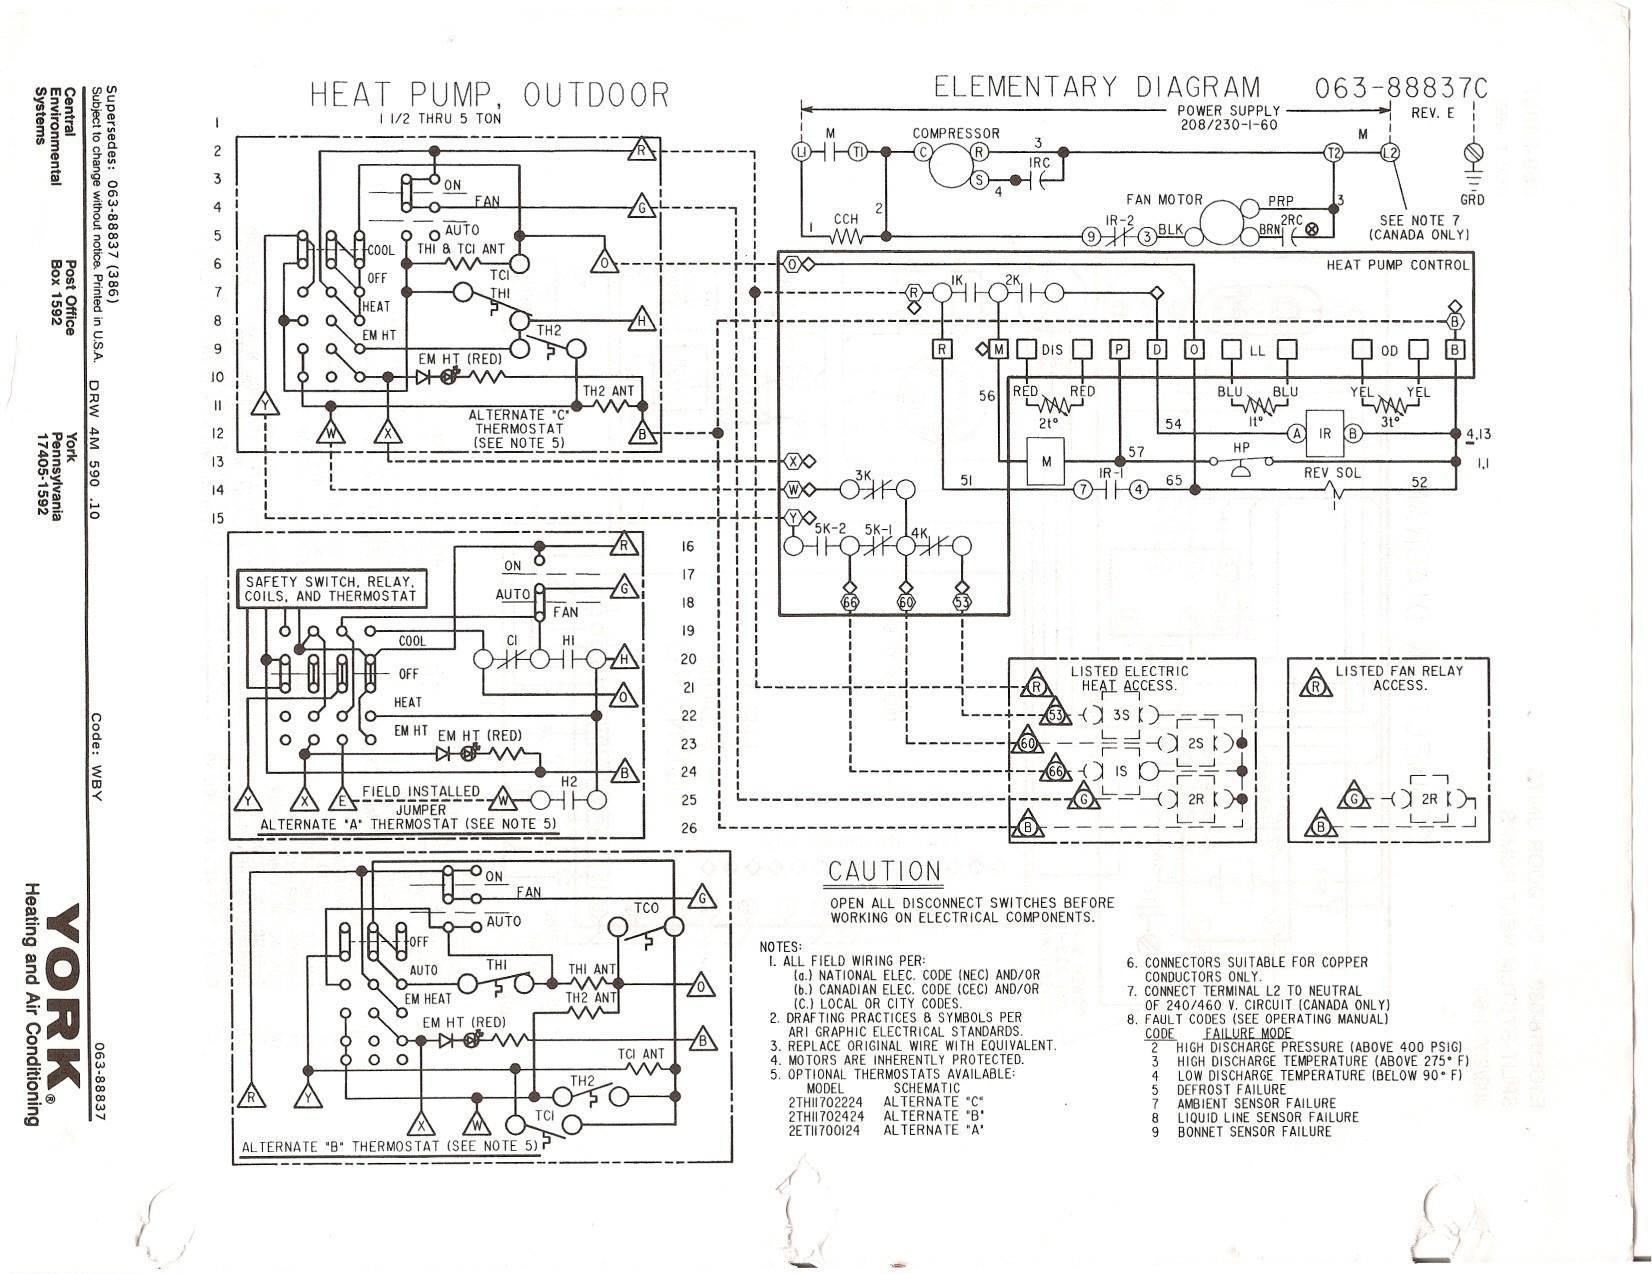 Heat Pump Wiring Diagram Schematic Wiring Diagram Image - Omron g7l 2a tubj  cb wiring diagram